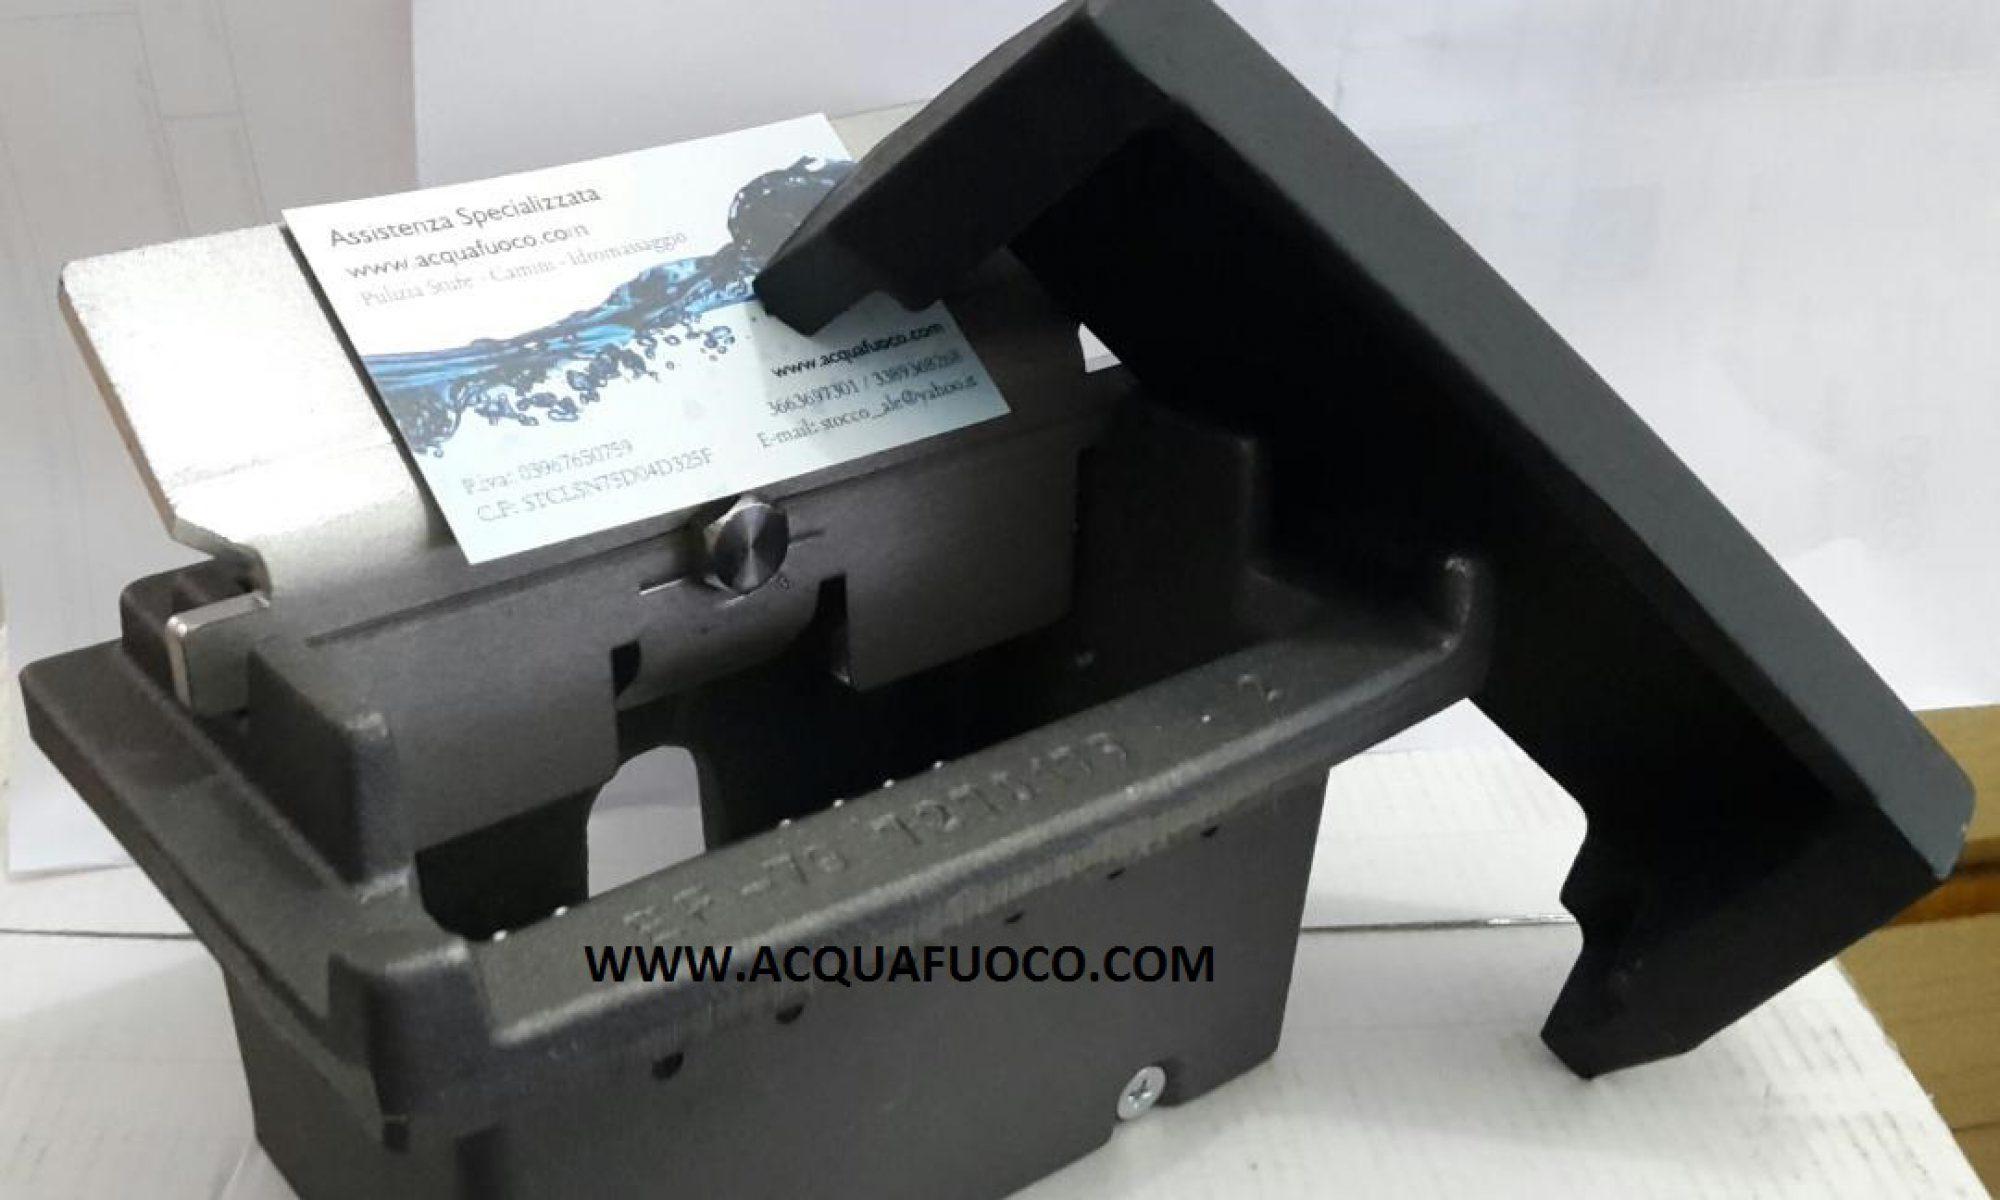 WWW.ACQUAFUOCO.COM